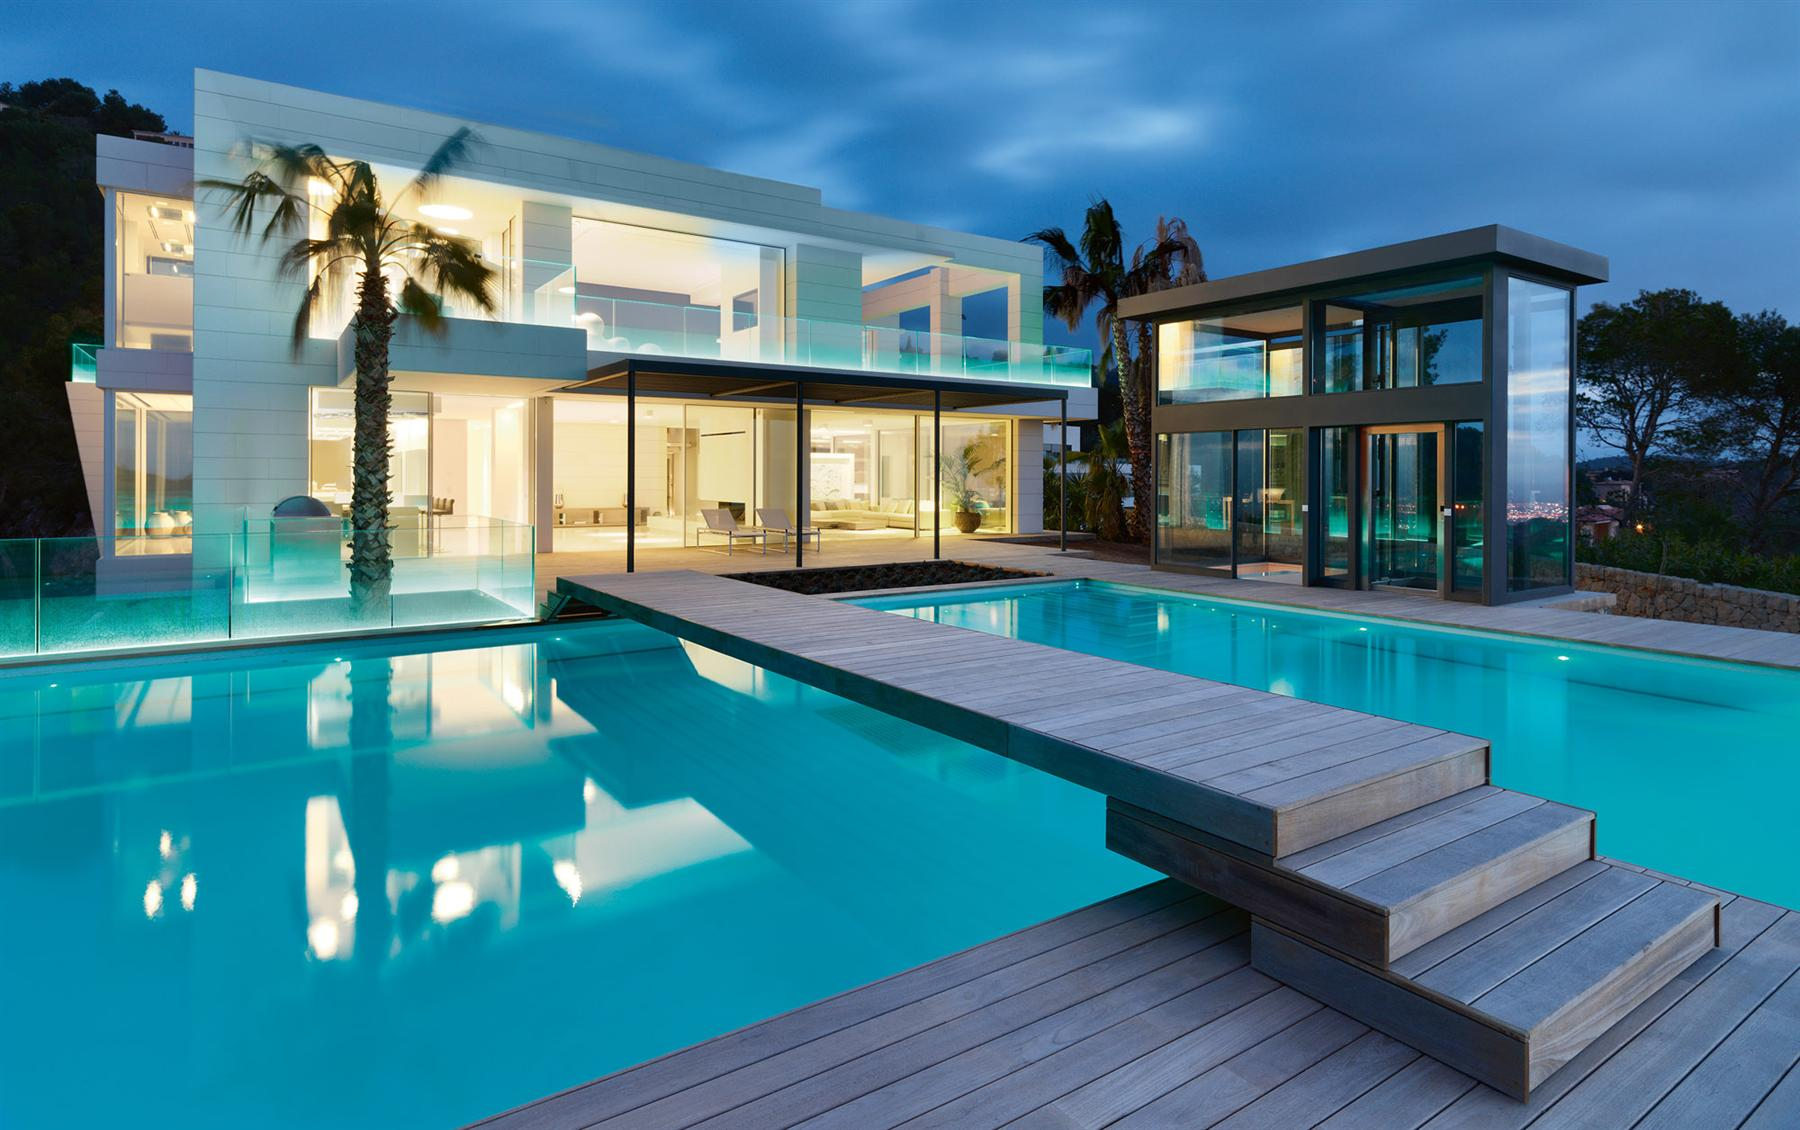 luxury chameleon villa in majorca spain caandesign. Black Bedroom Furniture Sets. Home Design Ideas